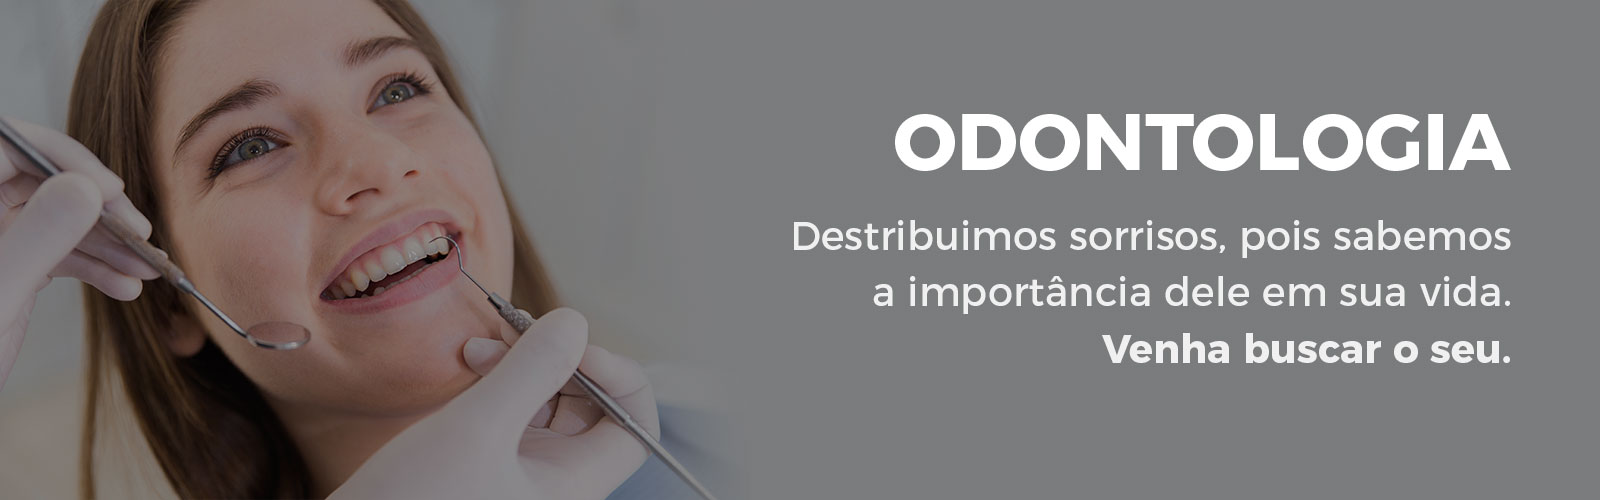 https://belaclin.com.br/odontologia